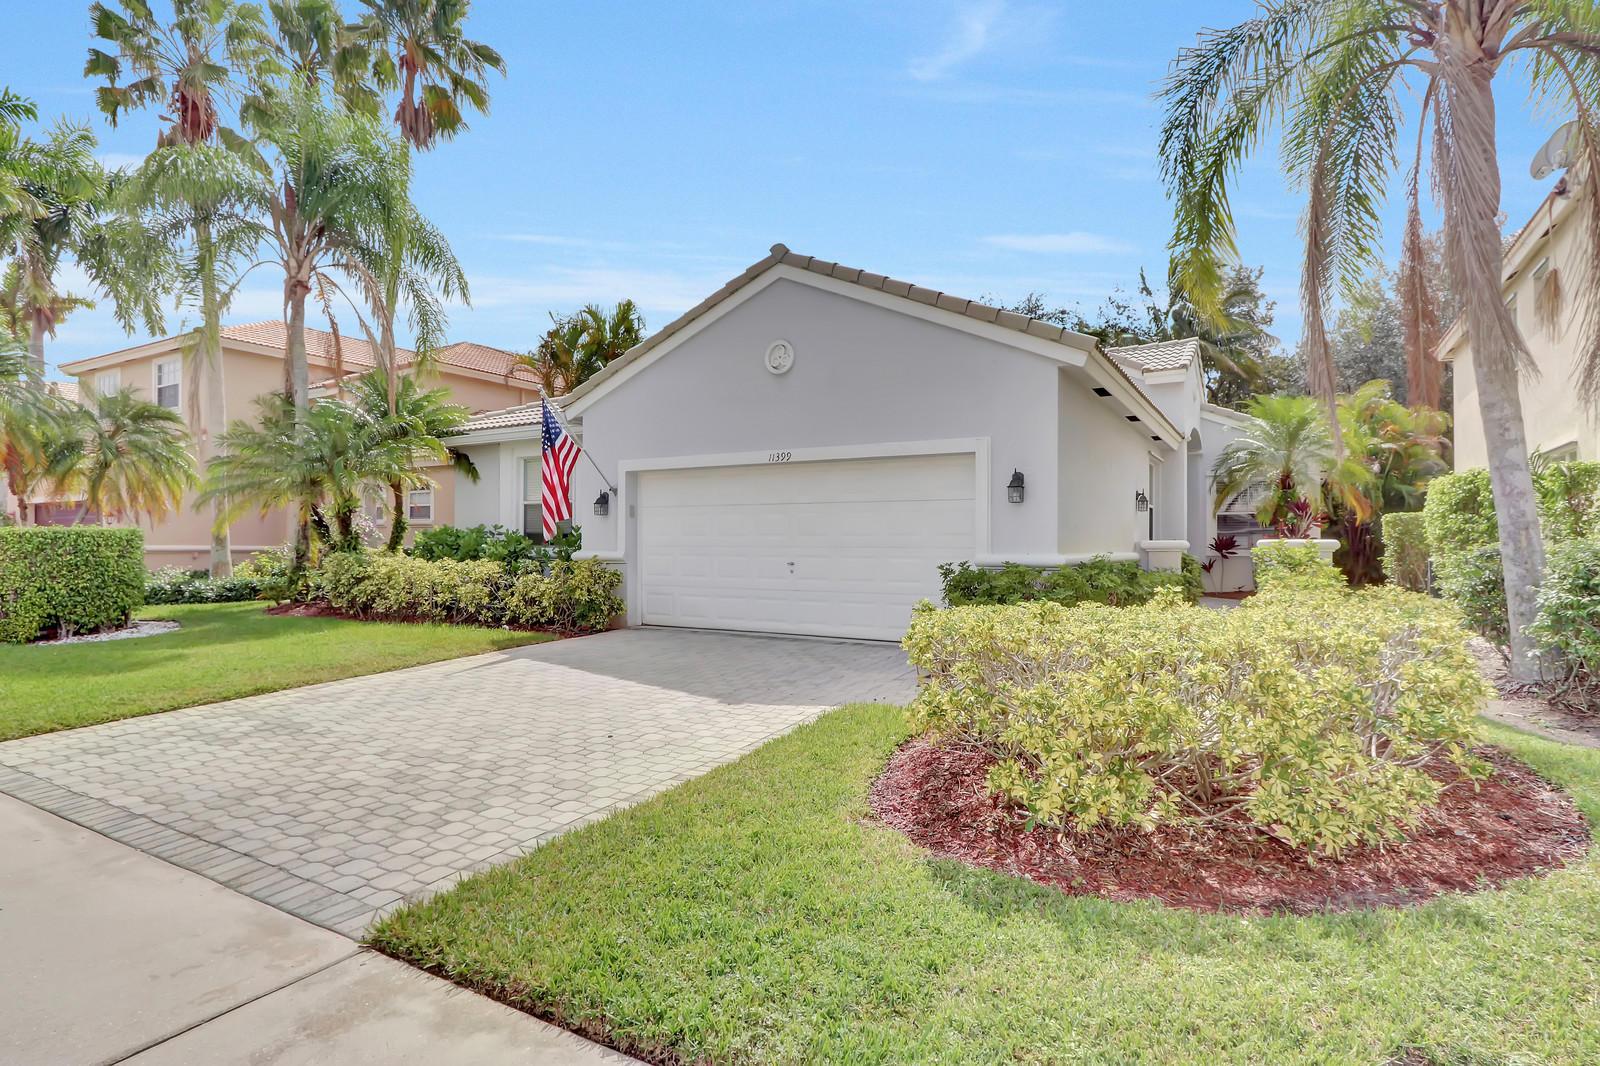 Photo of 11399 Sea Grass Circle, Boca Raton, FL 33498